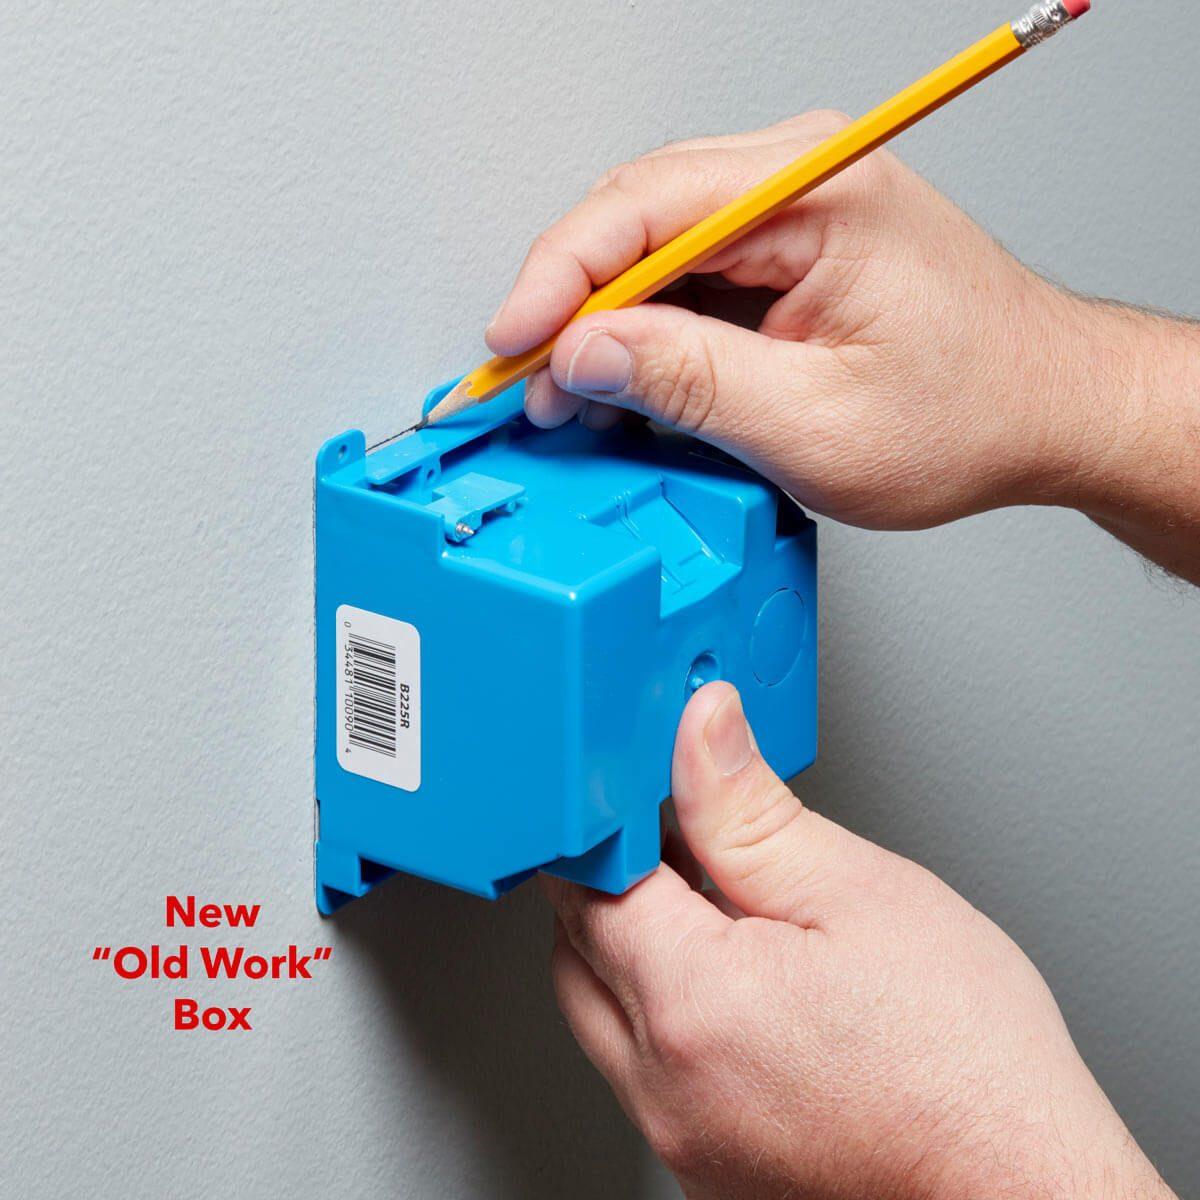 FH17ONO_582_54_012 trace the box